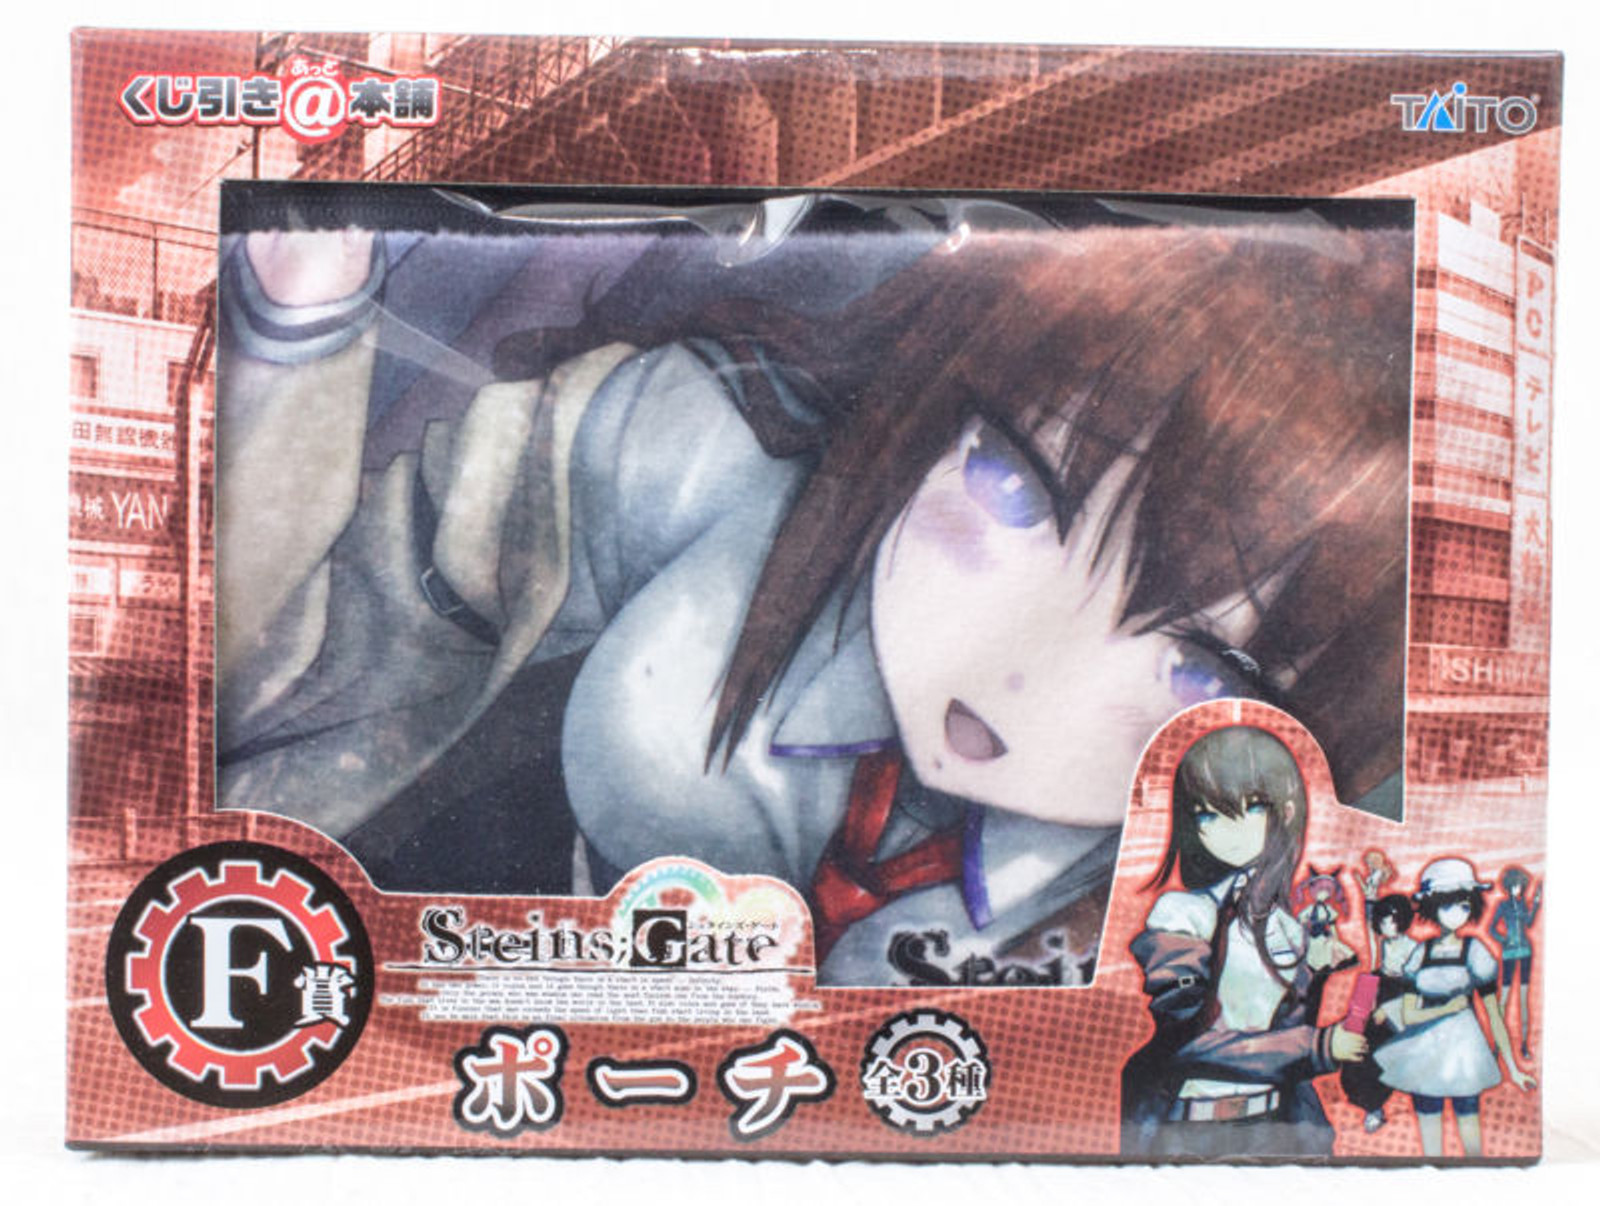 Steins ; Gate Kurisu Makise Pouch mini bag Taito Kuji JAPAN ANIME MANGA 1